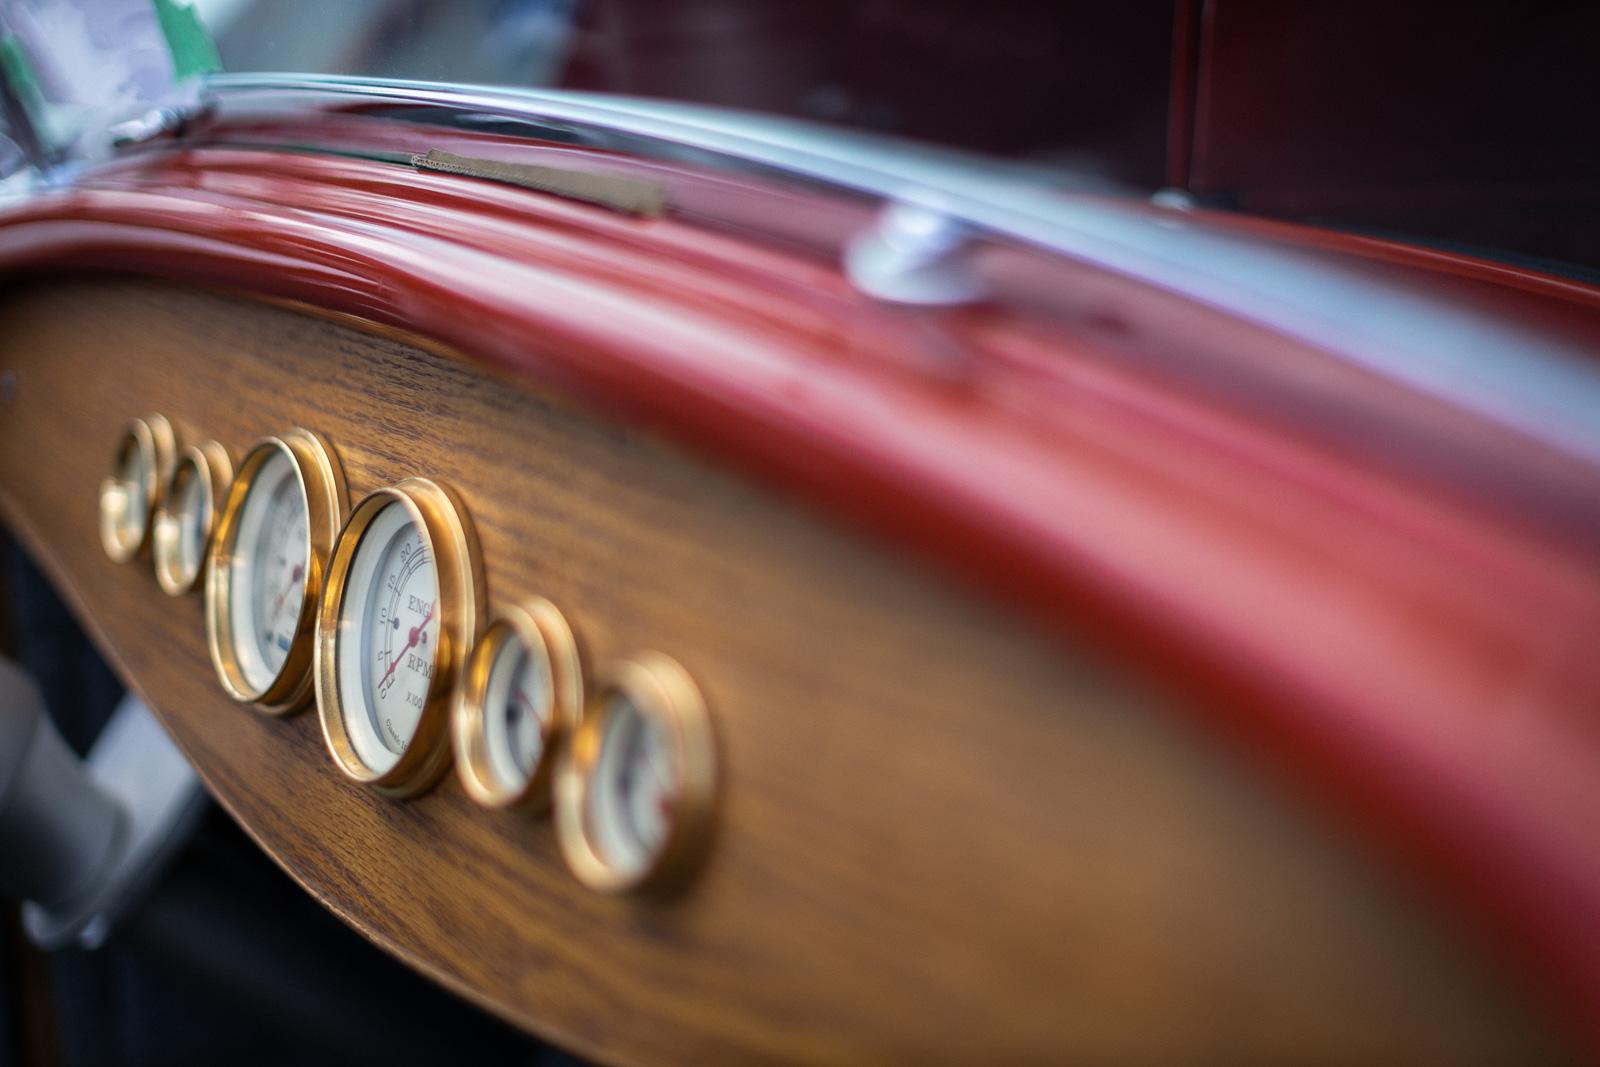 fat-guys-car-show-blog-40.jpg